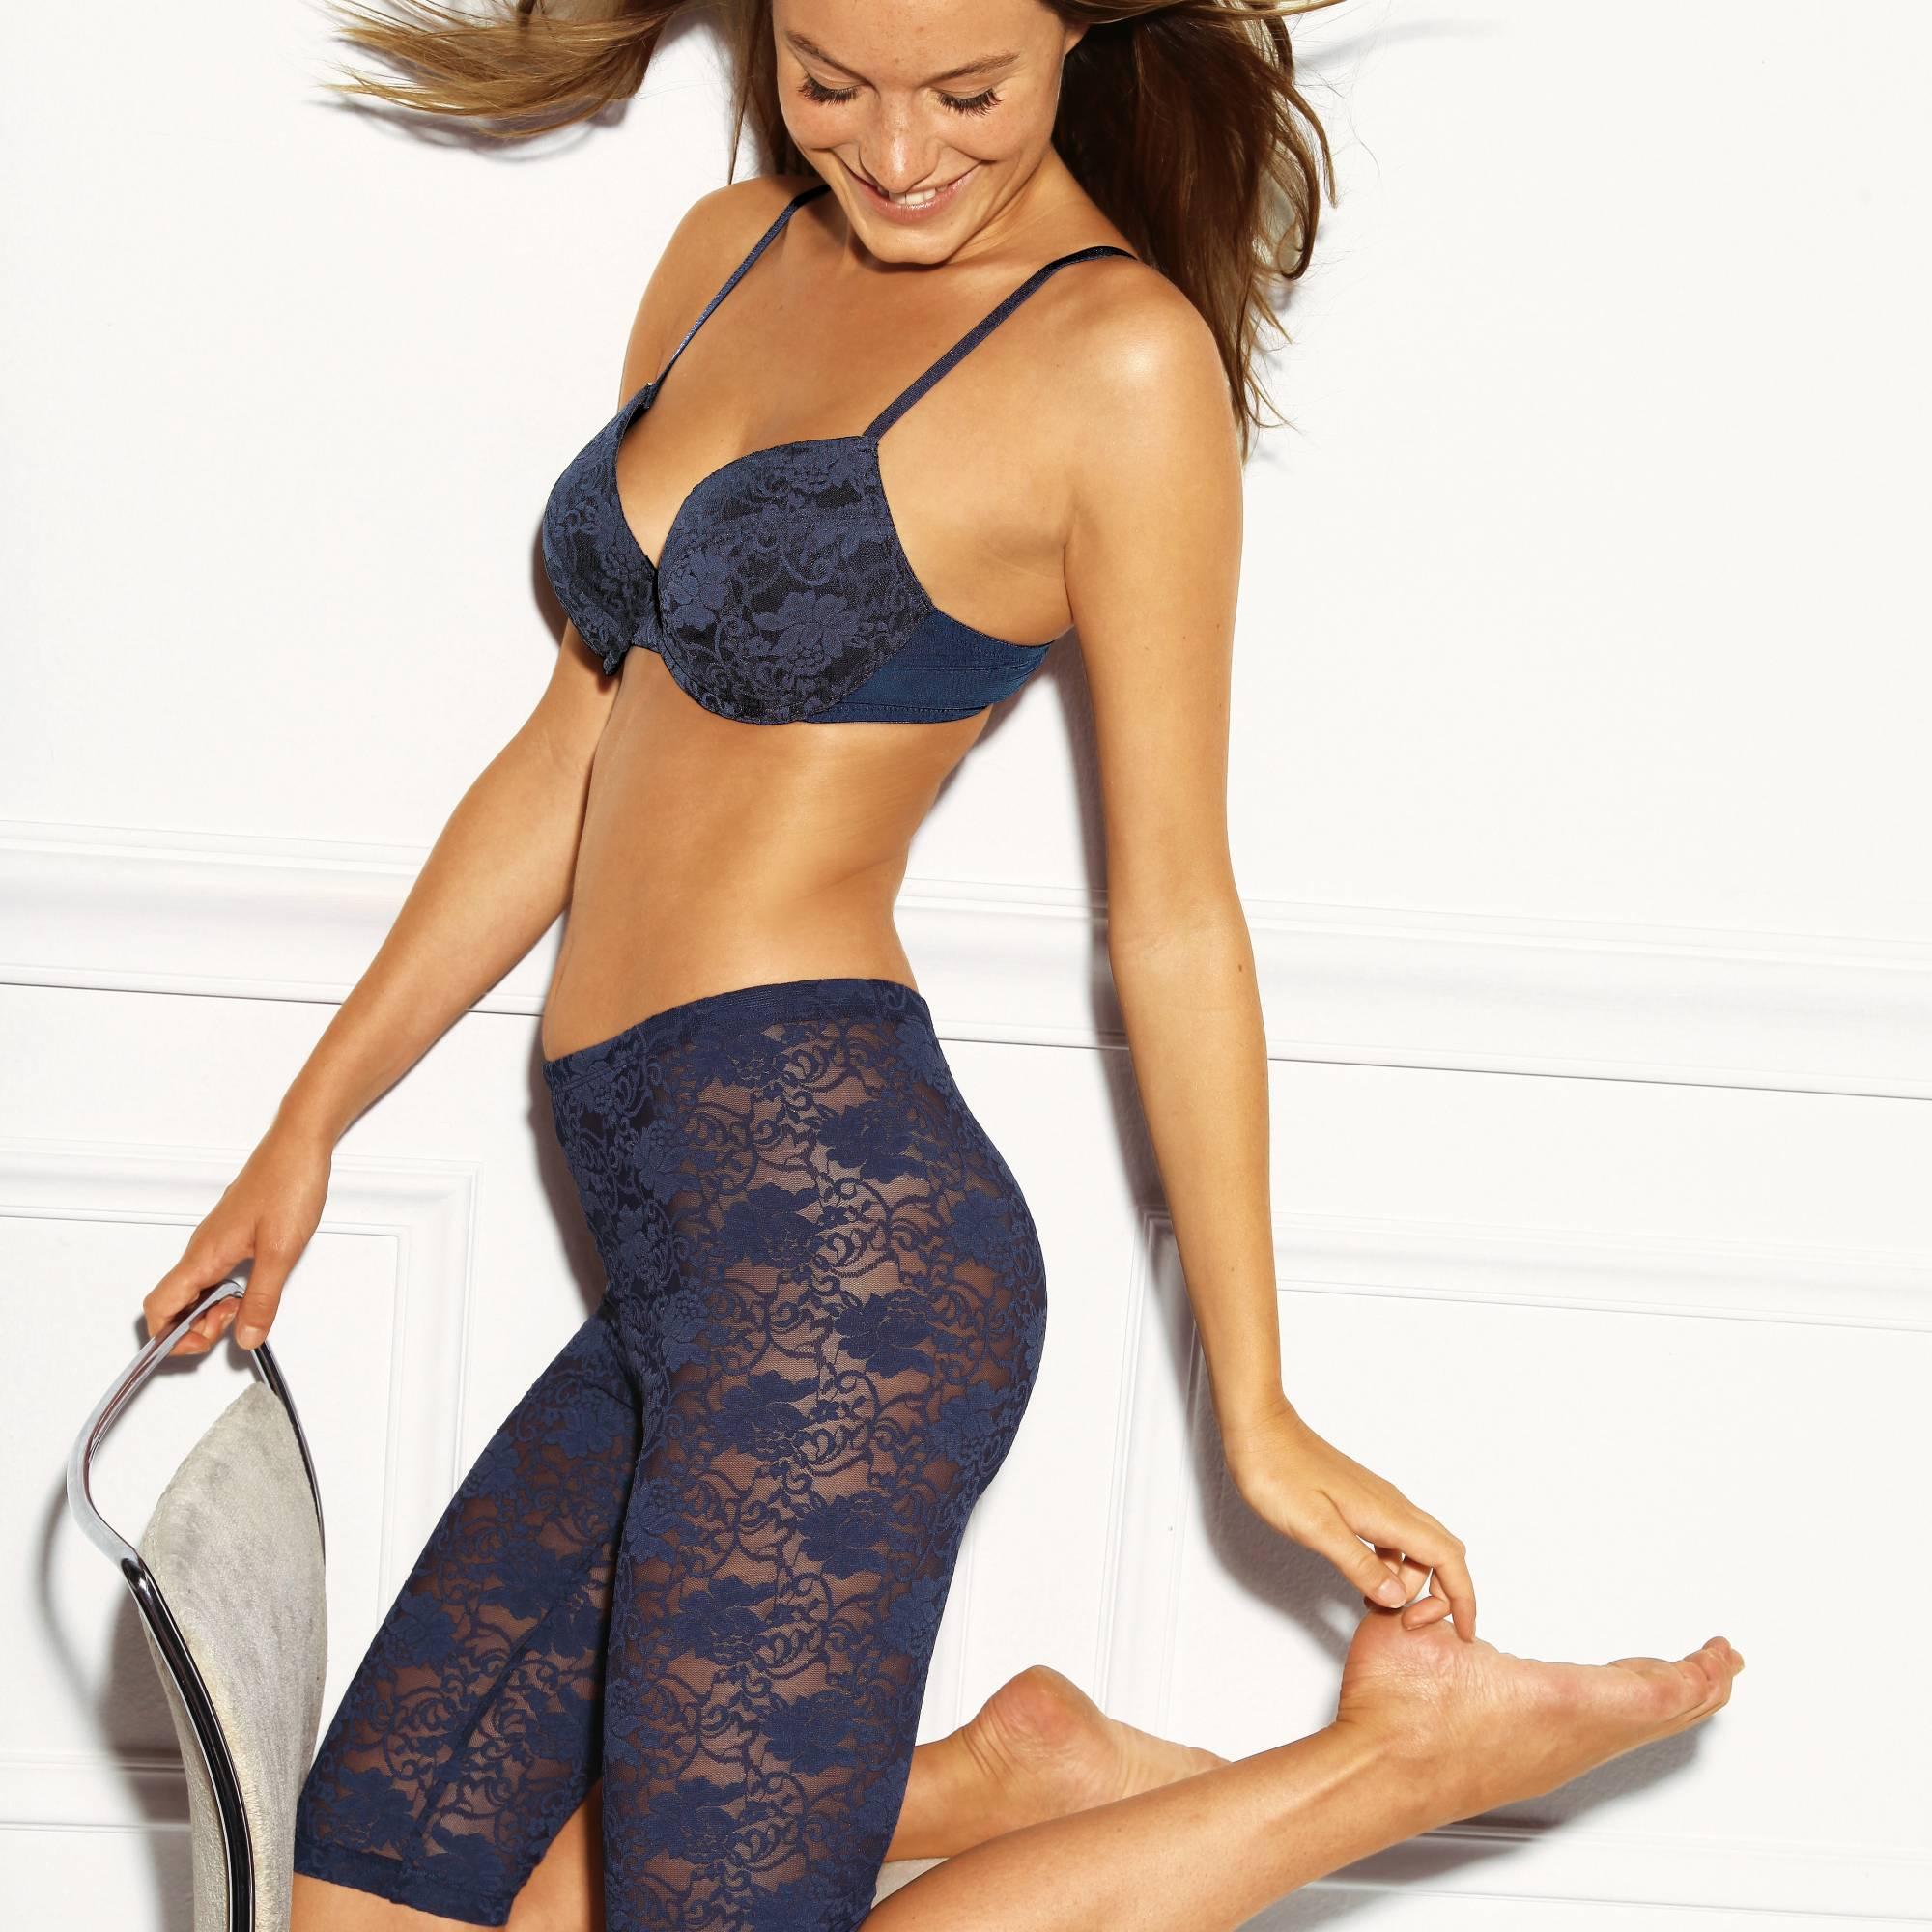 Feet Camille Rowe naked (24 photo), Tits, Bikini, Boobs, braless 2015